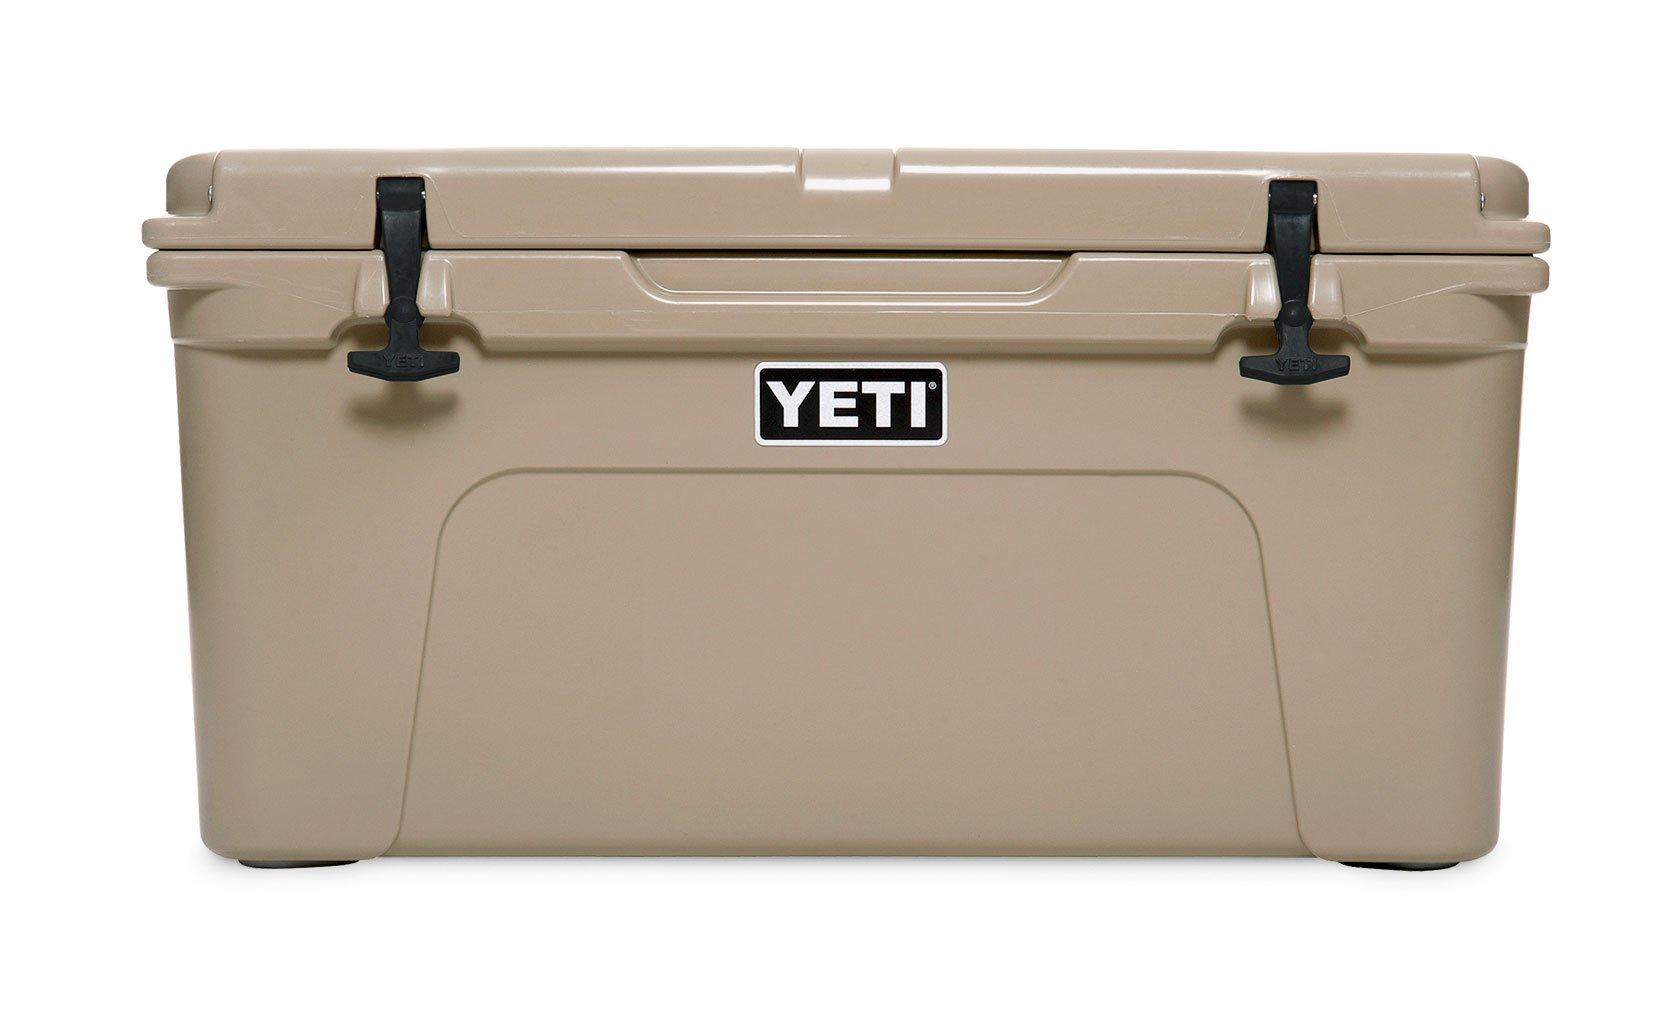 A beige Yeti cooler.